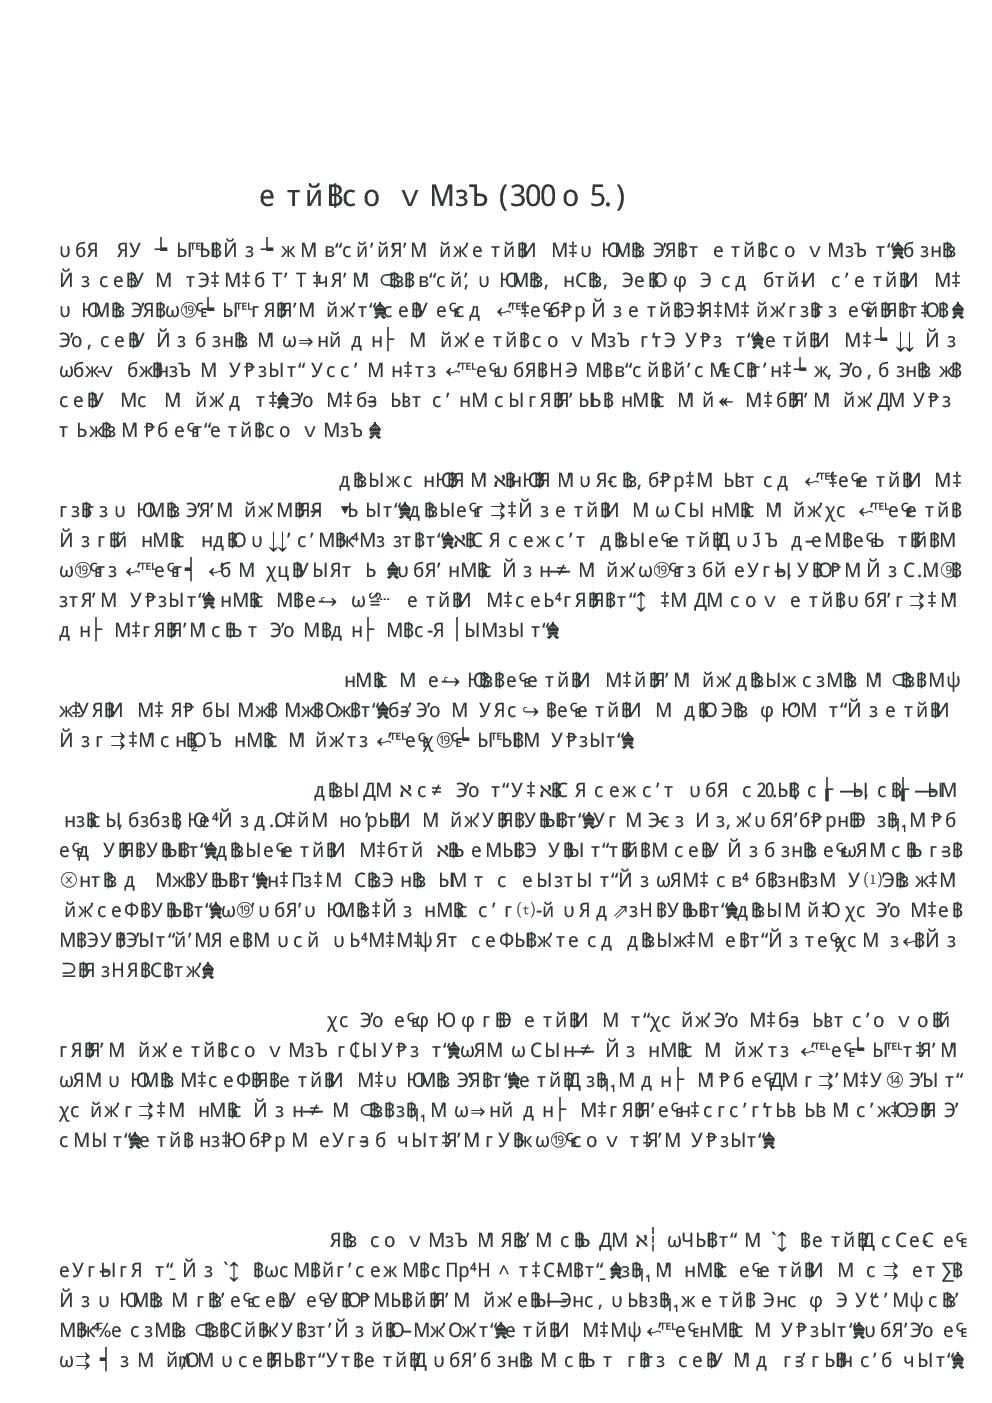 Subhas bose essay help